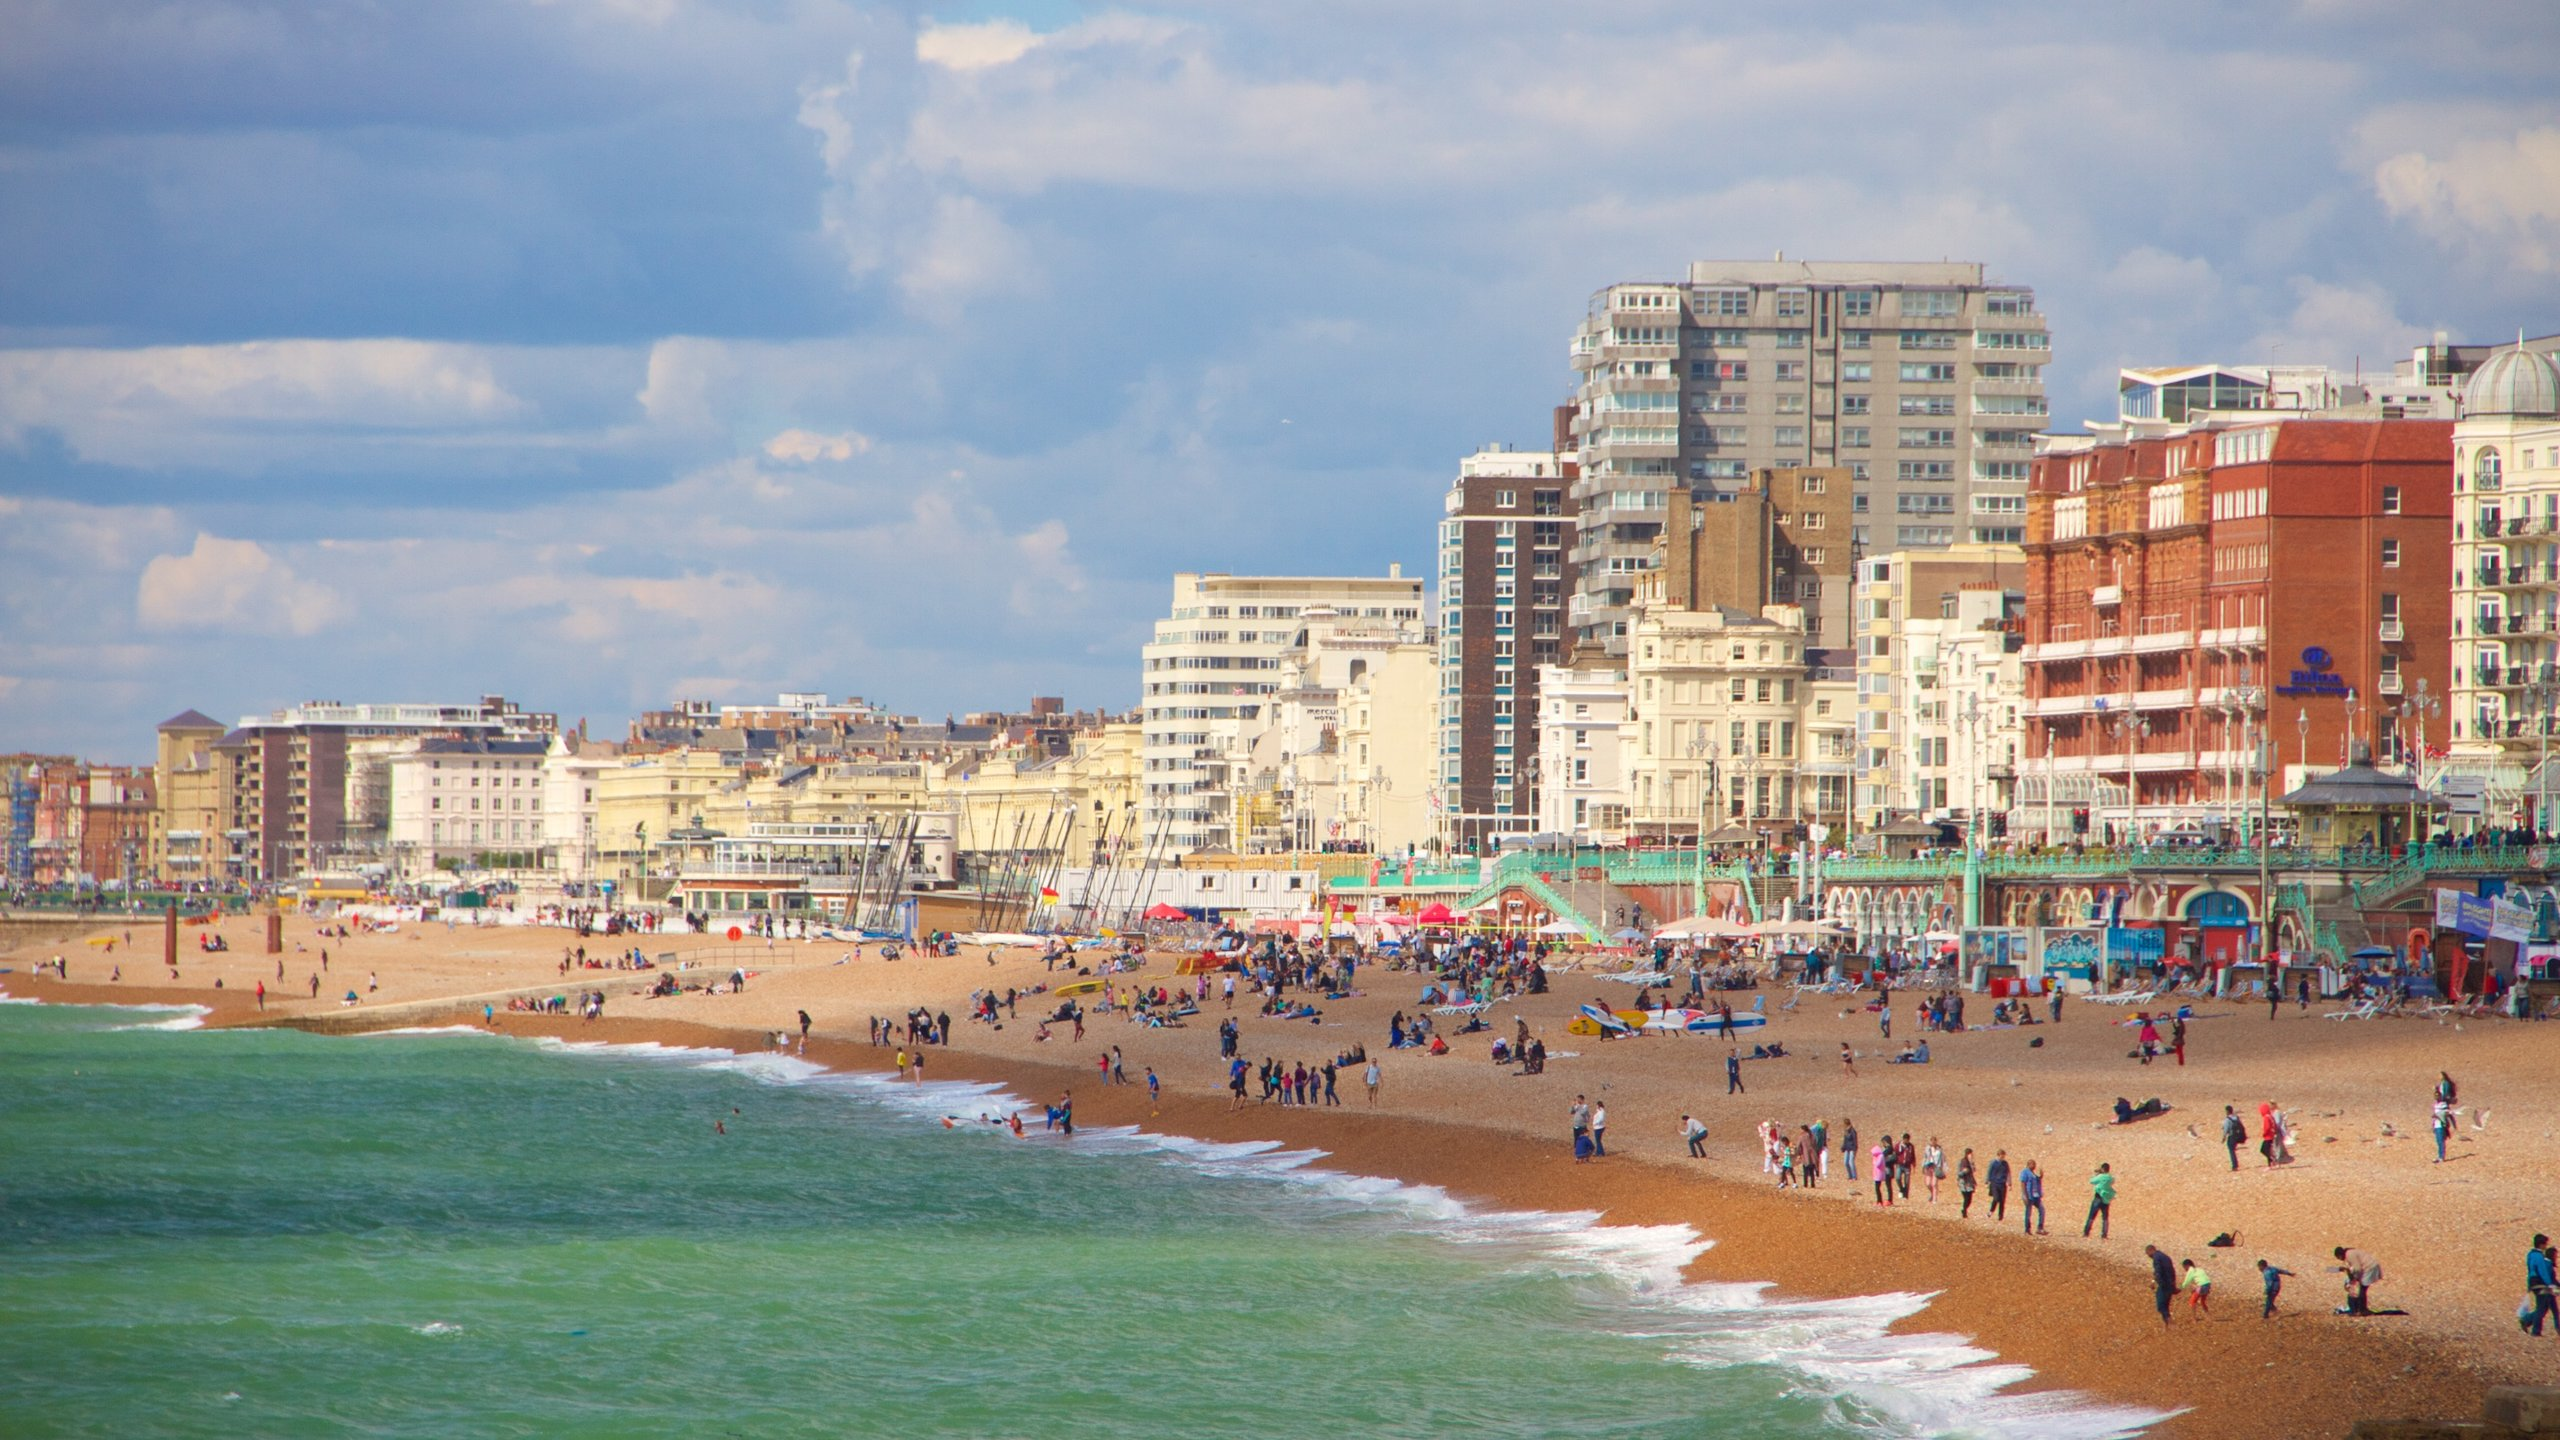 Brighton Beach, Brighton, England, United Kingdom